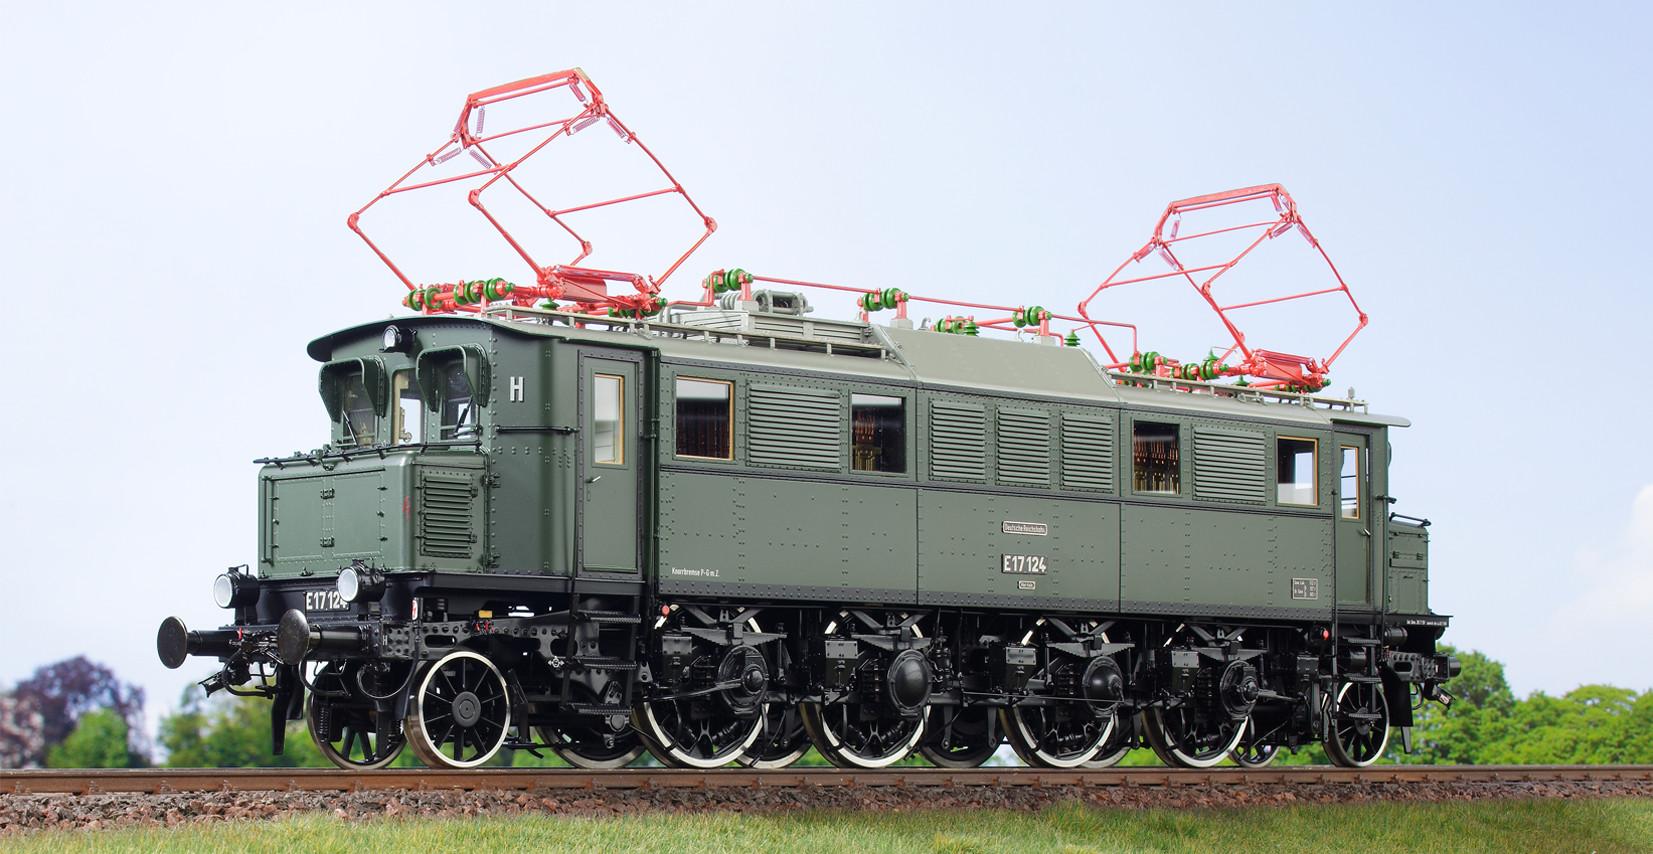 Spur 1 Lokomotive Baureihe E 17 124 Epoche IIIb DRo flaschengrün